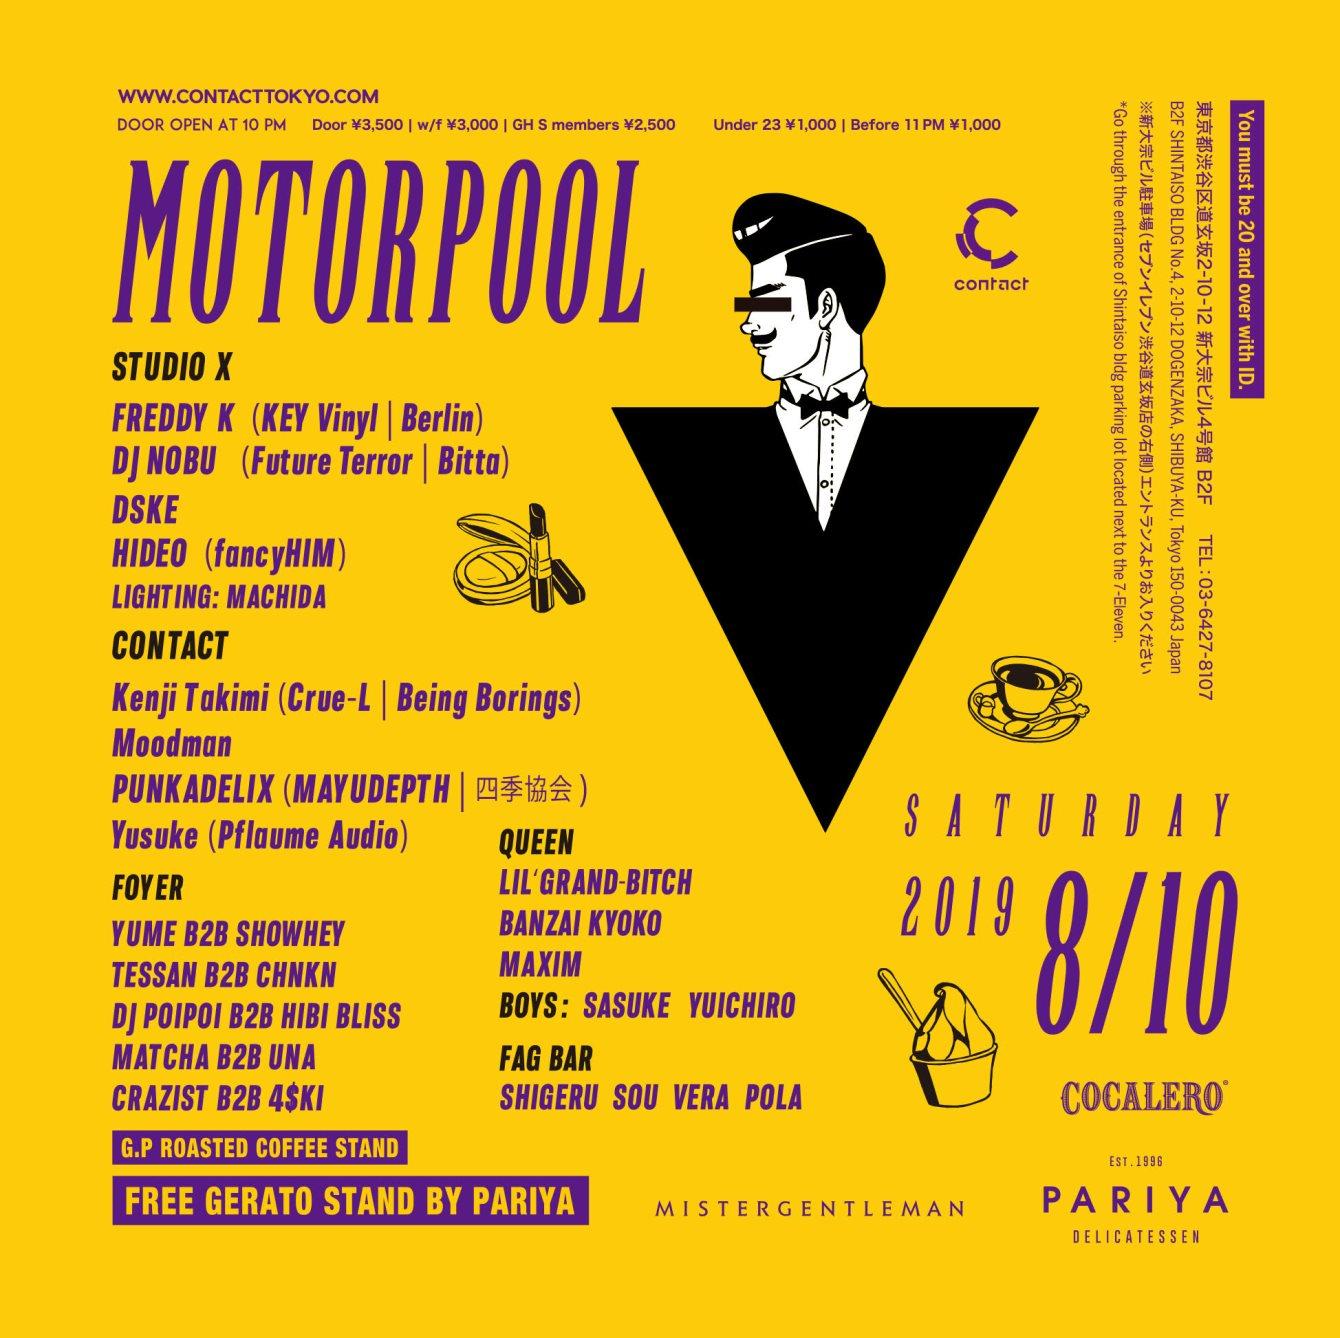 Motorpool Feat. Freddy K & DJ Nobu - Flyer back